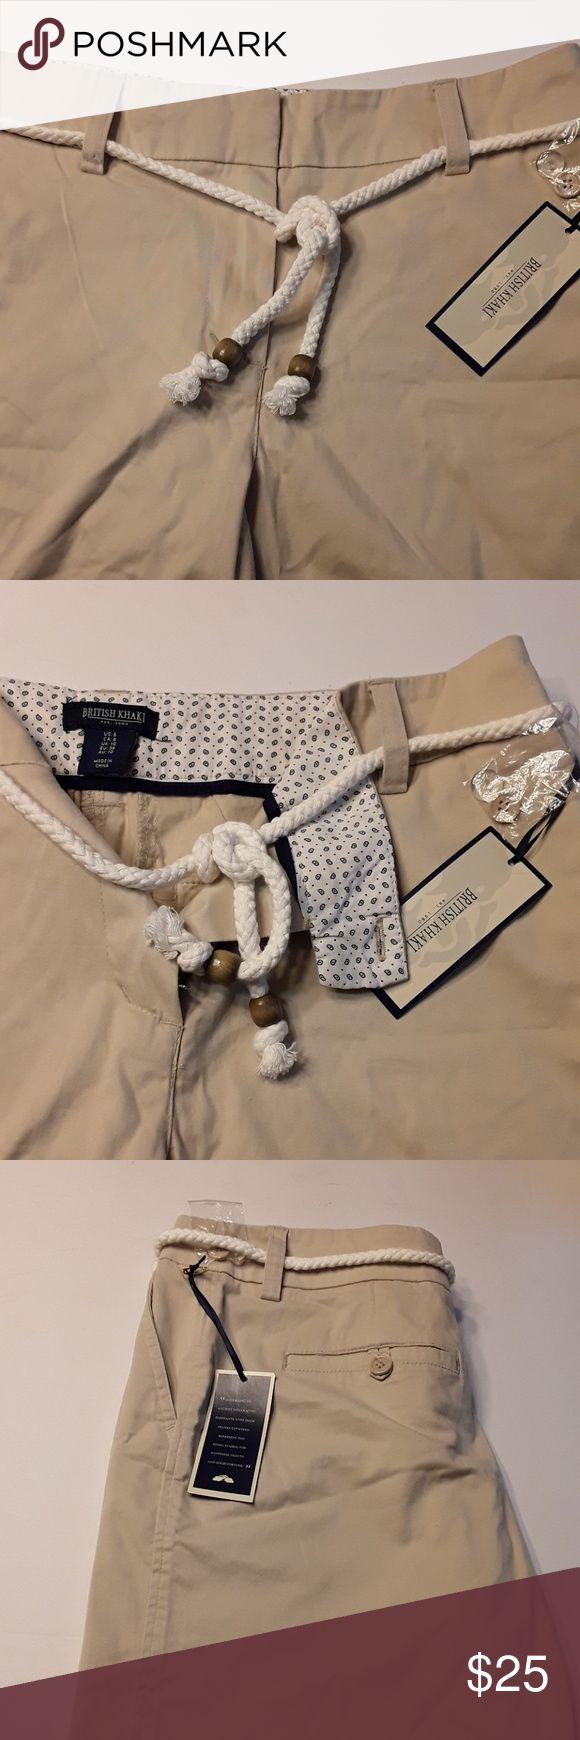 "{British Khaki} Khaki Nautical Shorts NWT: Super Soft Kahki Shorts by British Khaki. They come with a cute nautical rope belt. Front size pockets and Back hidden pockets. Measurements (flat): Waist 16"", Rise 9"" British Khaki Shorts"